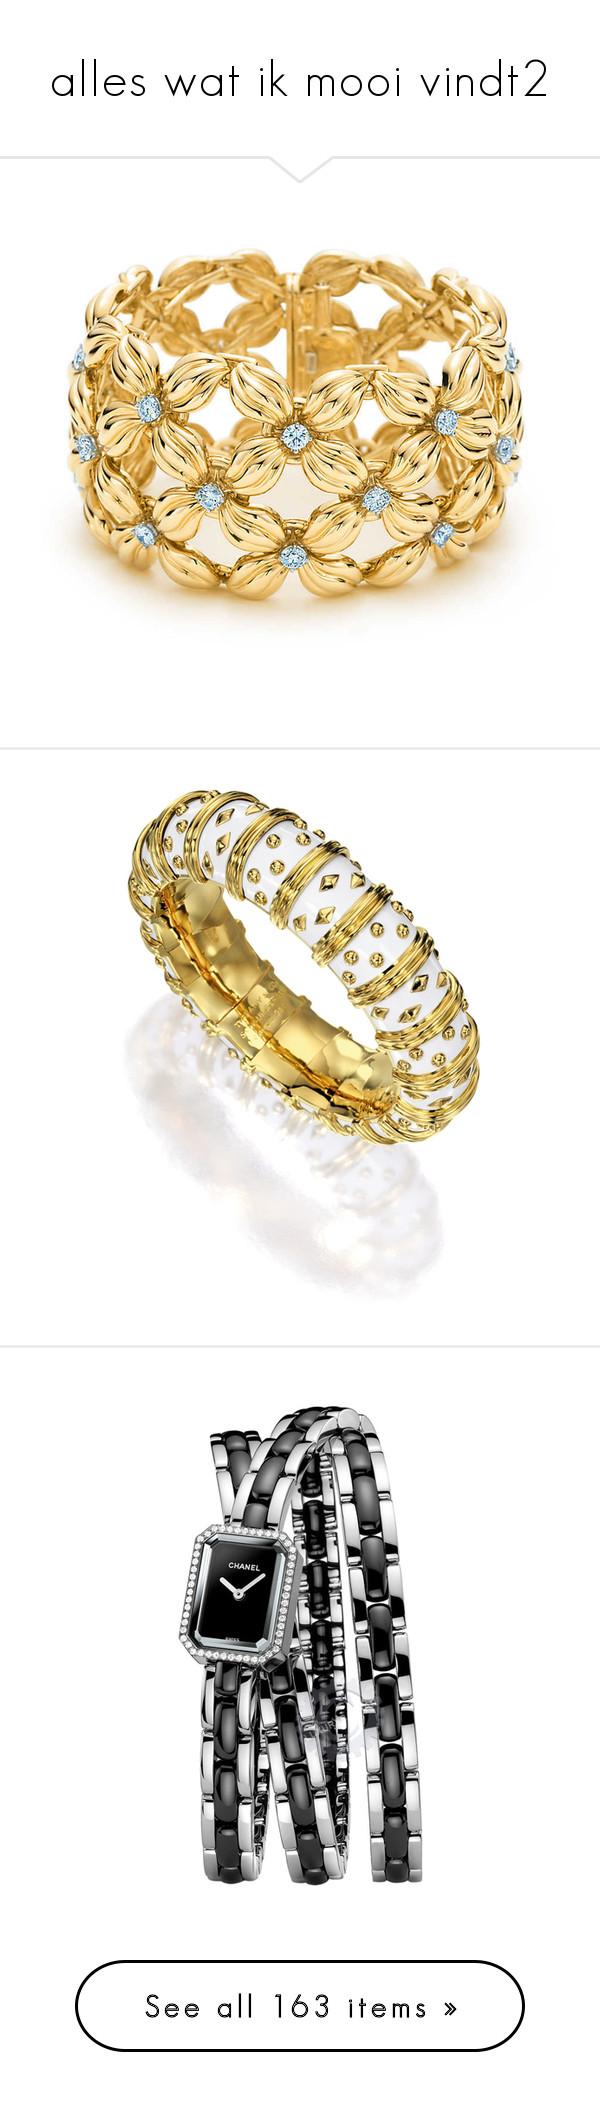 """alles wat ik mooi vindt2"" by bluemoon ❤ liked on Polyvore featuring jewelry, bracelets, accessories, tiffany co jewellery, flower jewellery, daisy jewelry, 18k jewelry, 18 karat gold jewelry, white enamel jewelry and enamel bangle"